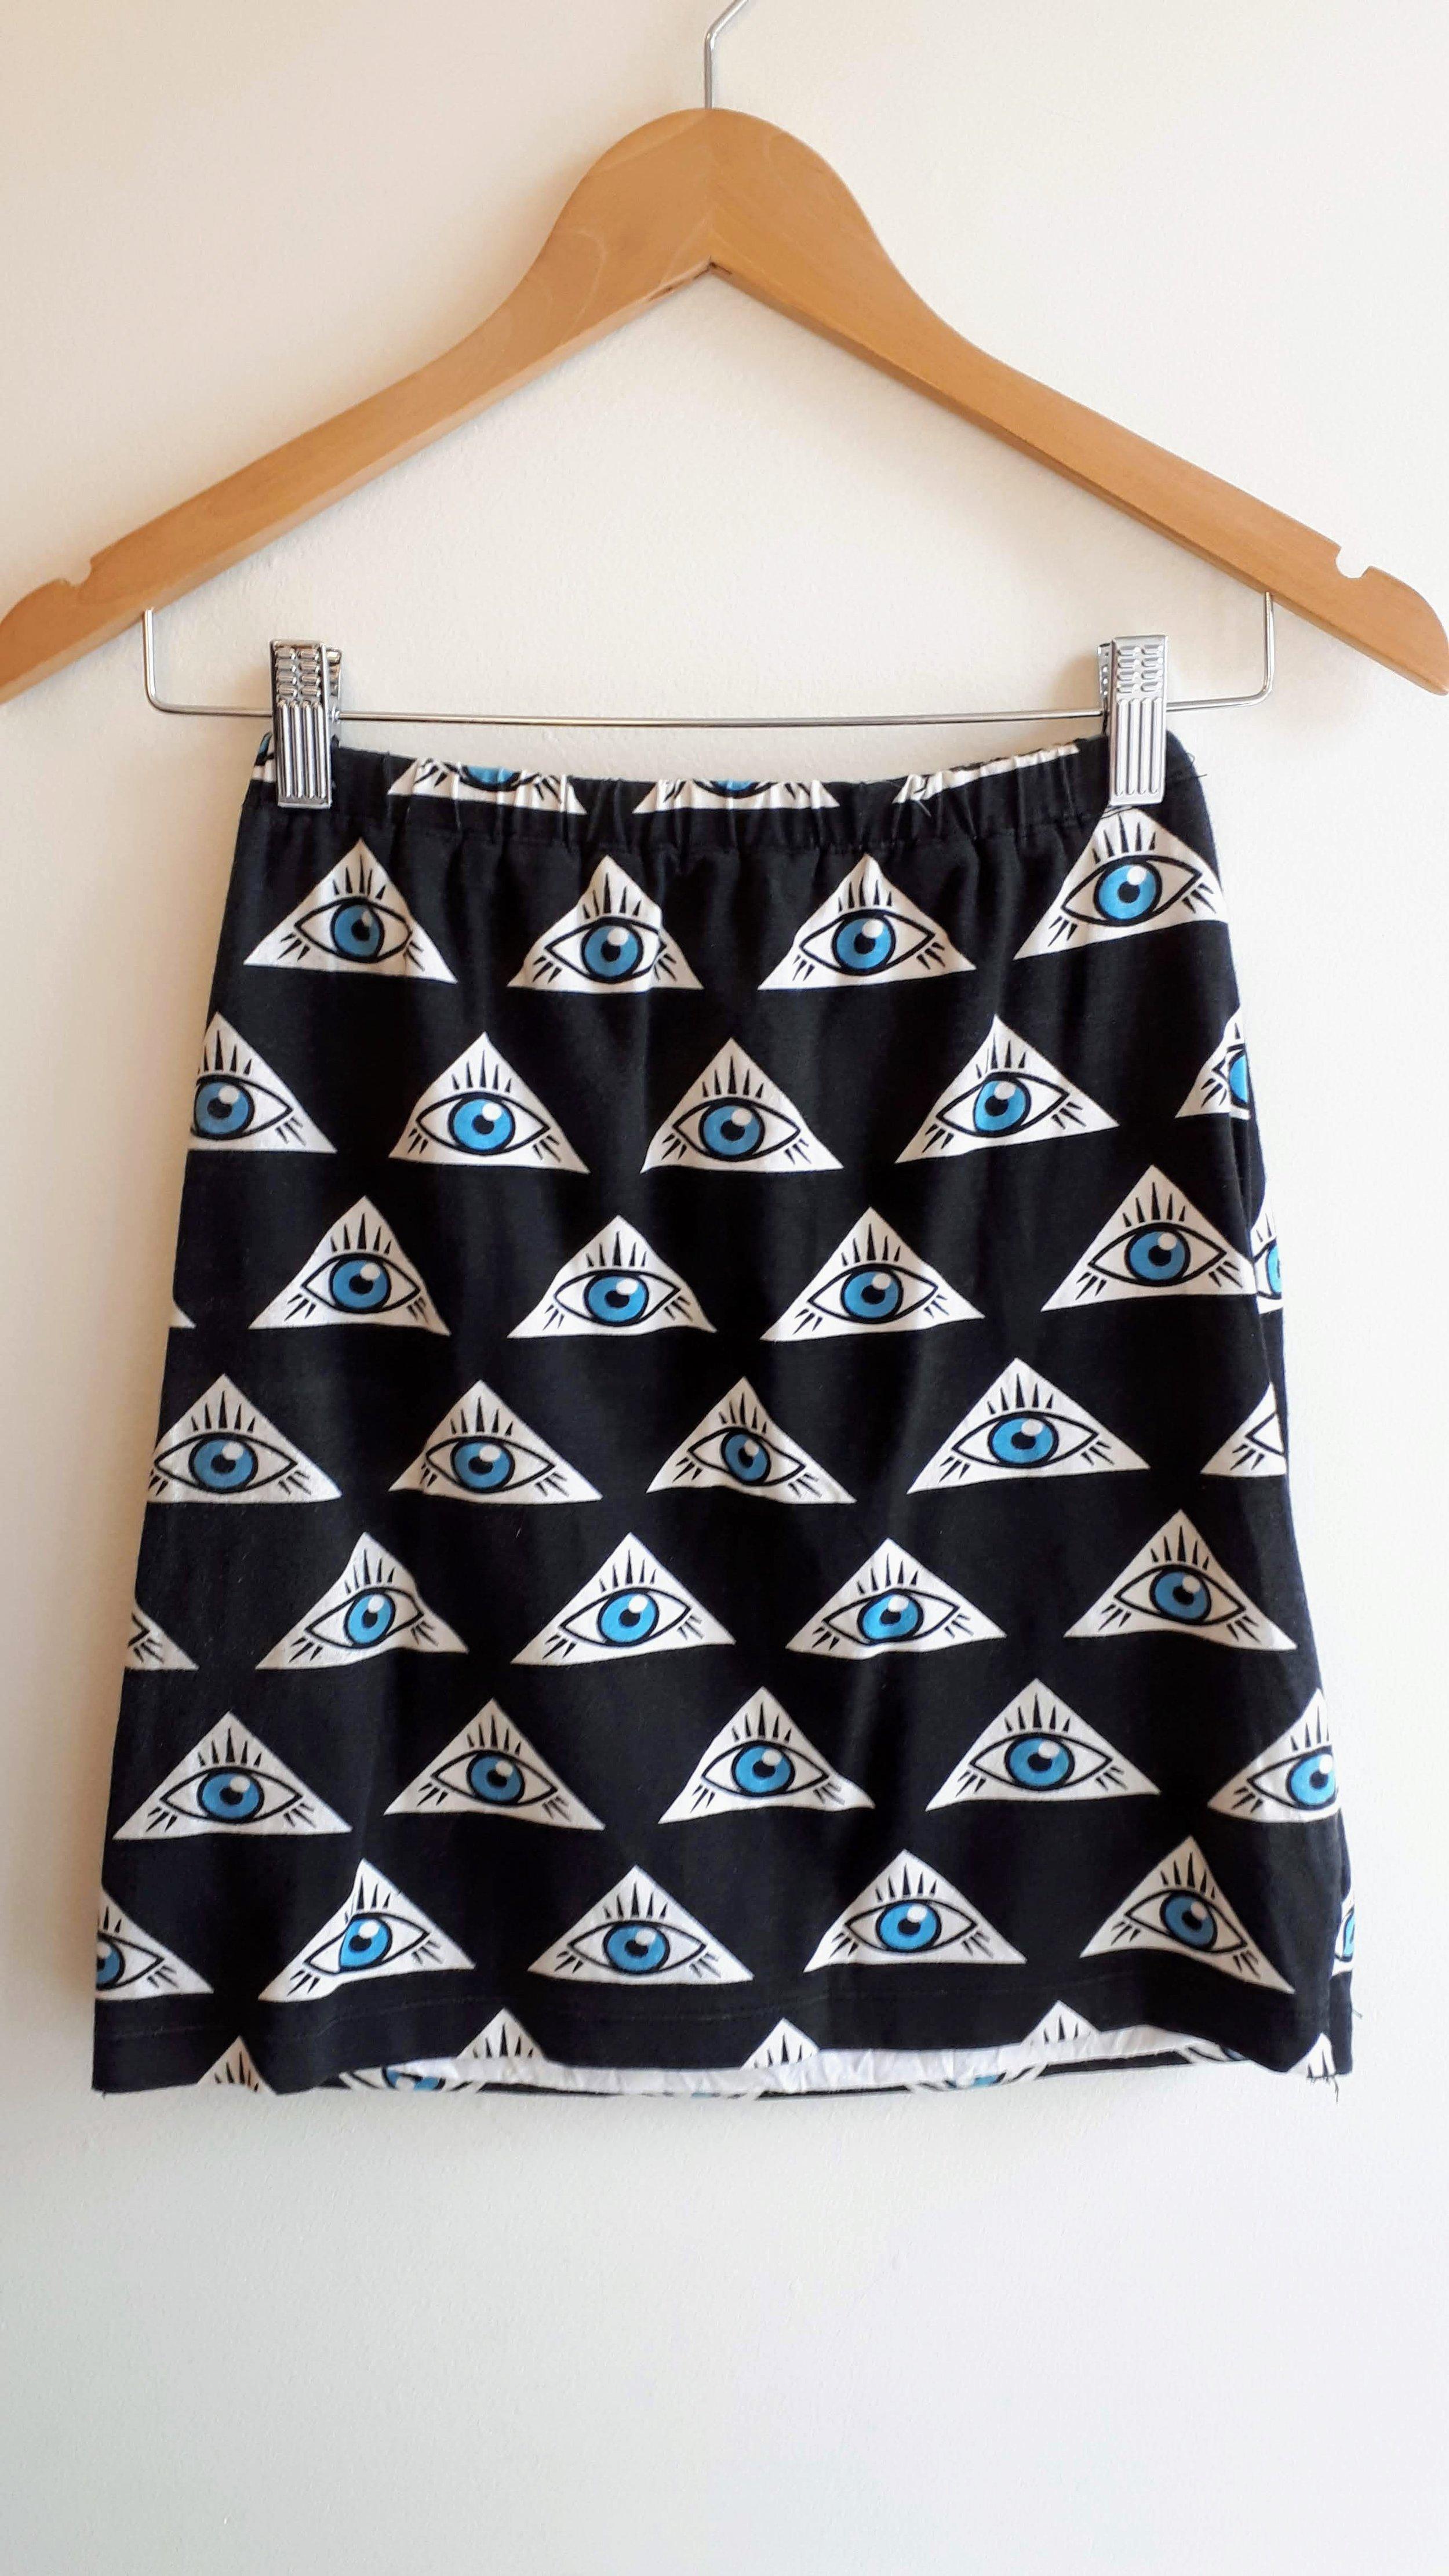 Suka skirt; Size S, $39